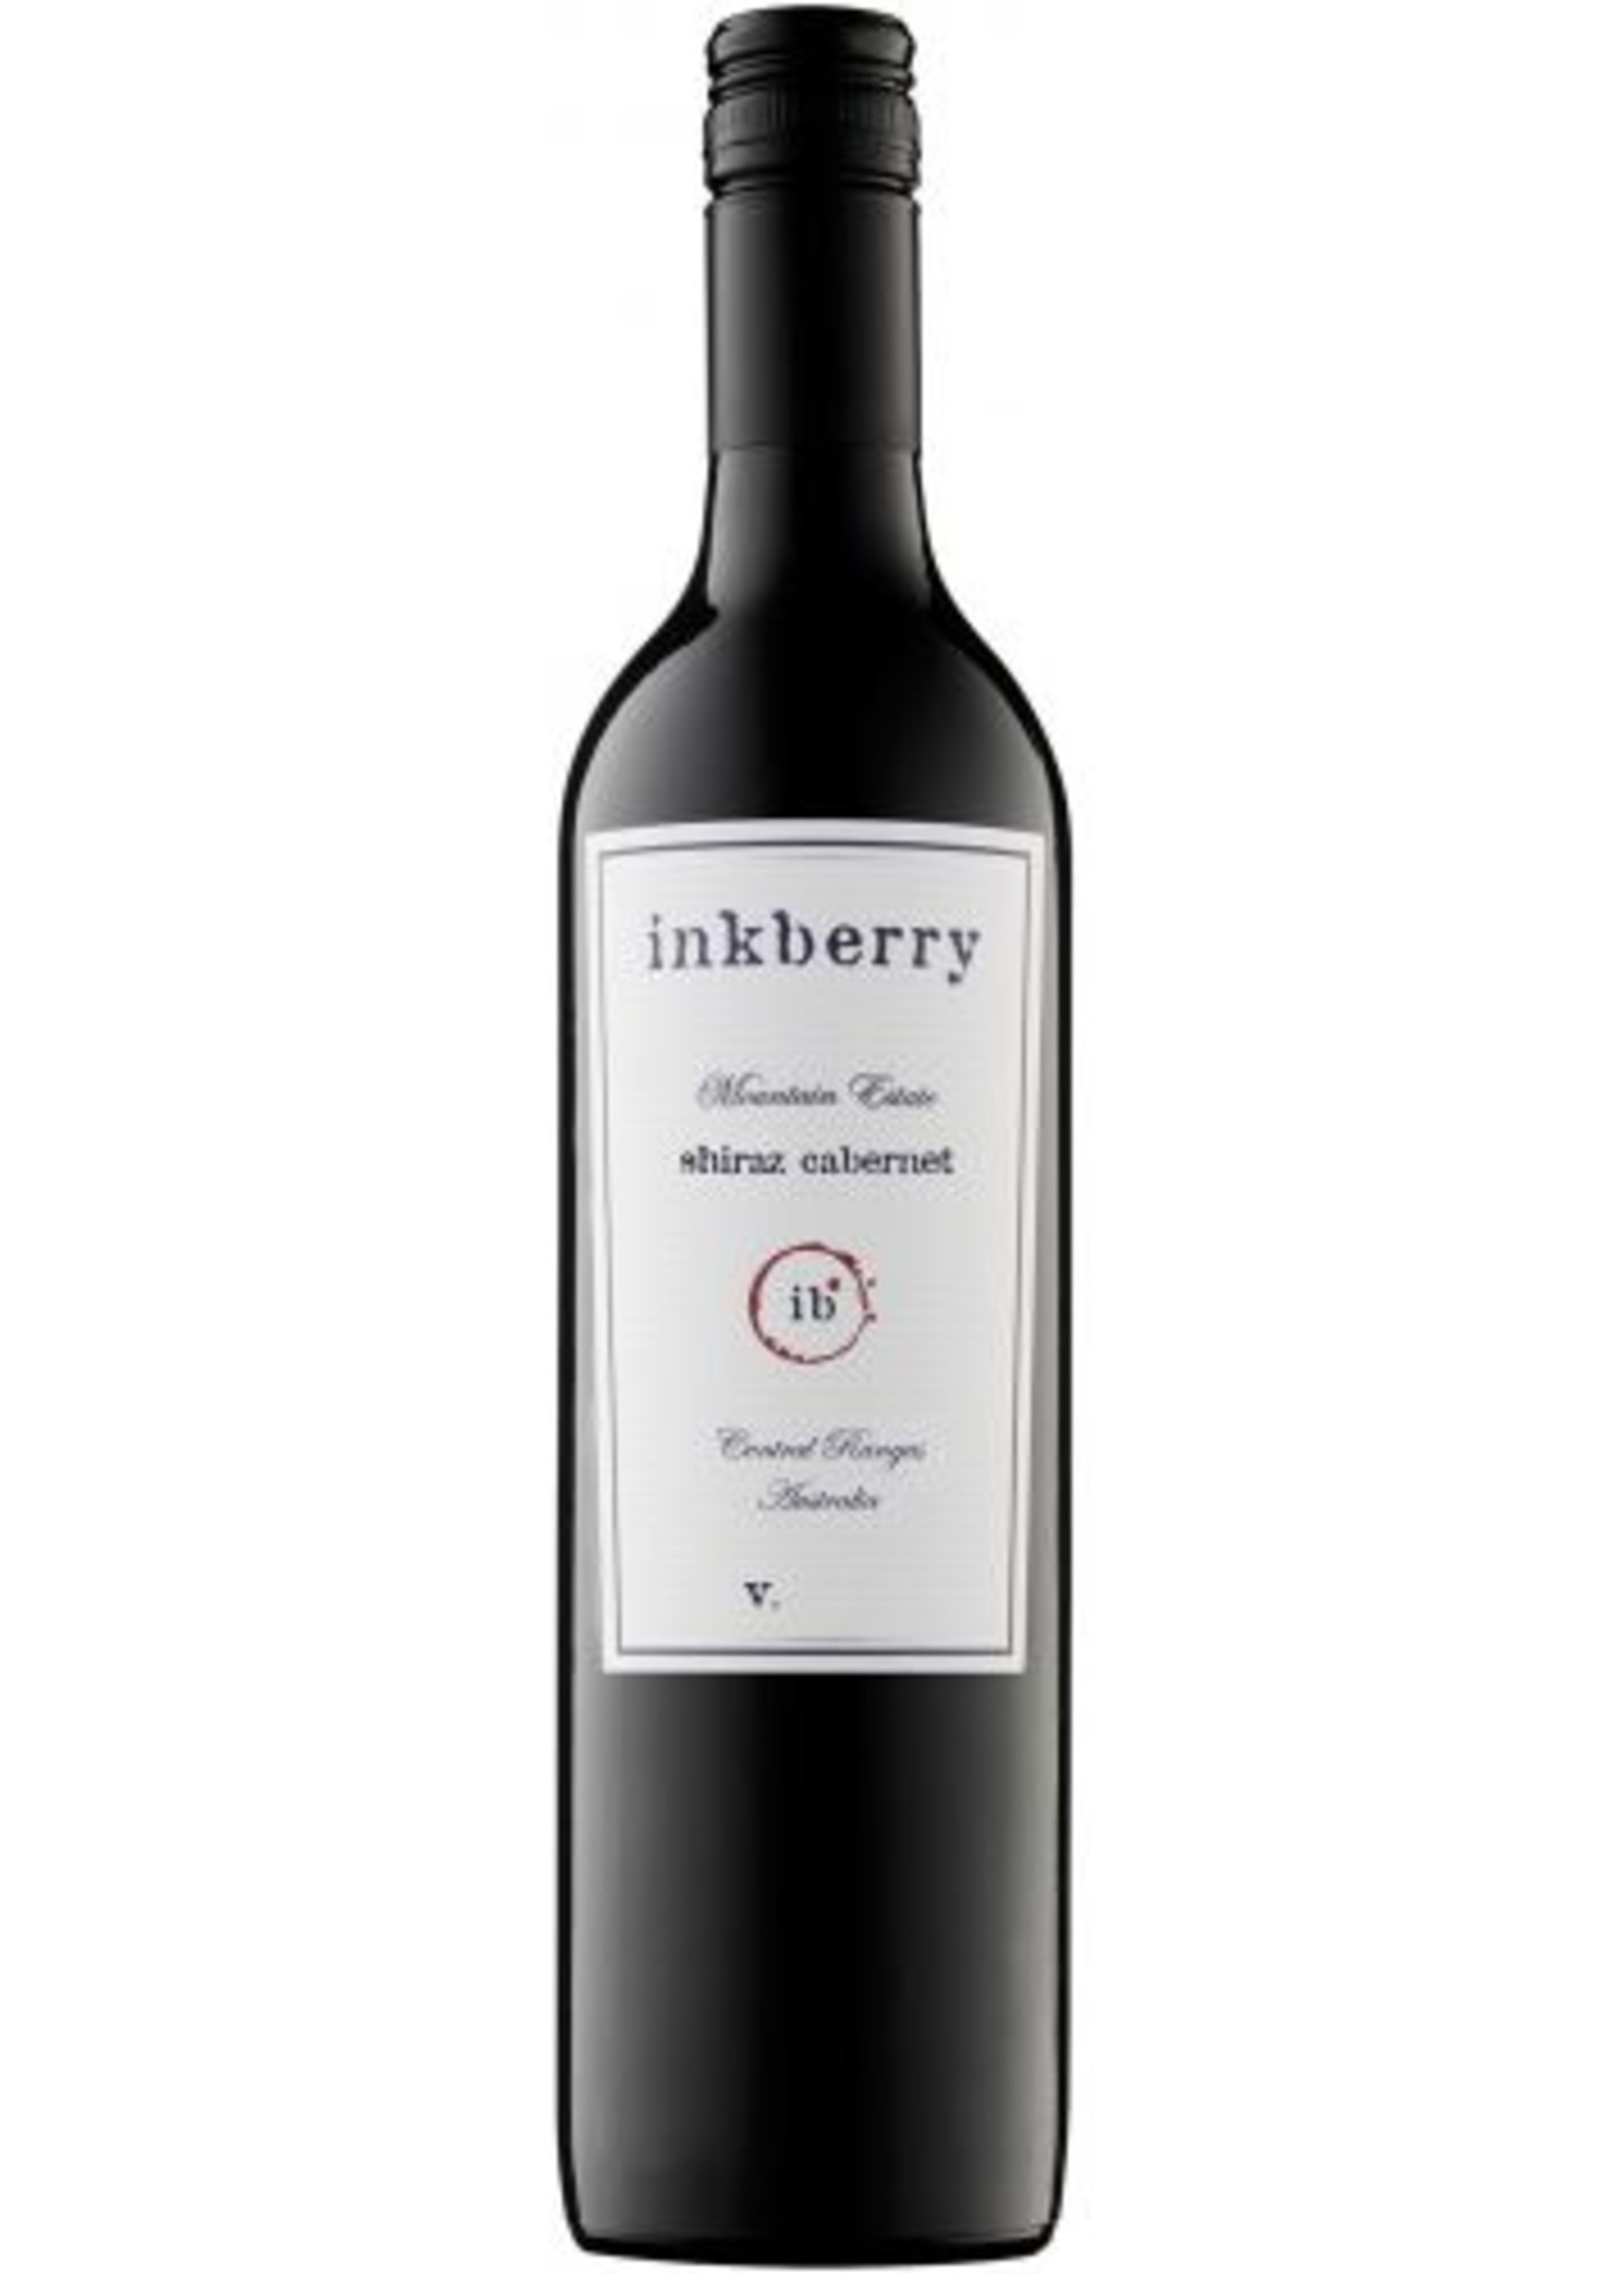 Inkberry Shiraz/Cabernet